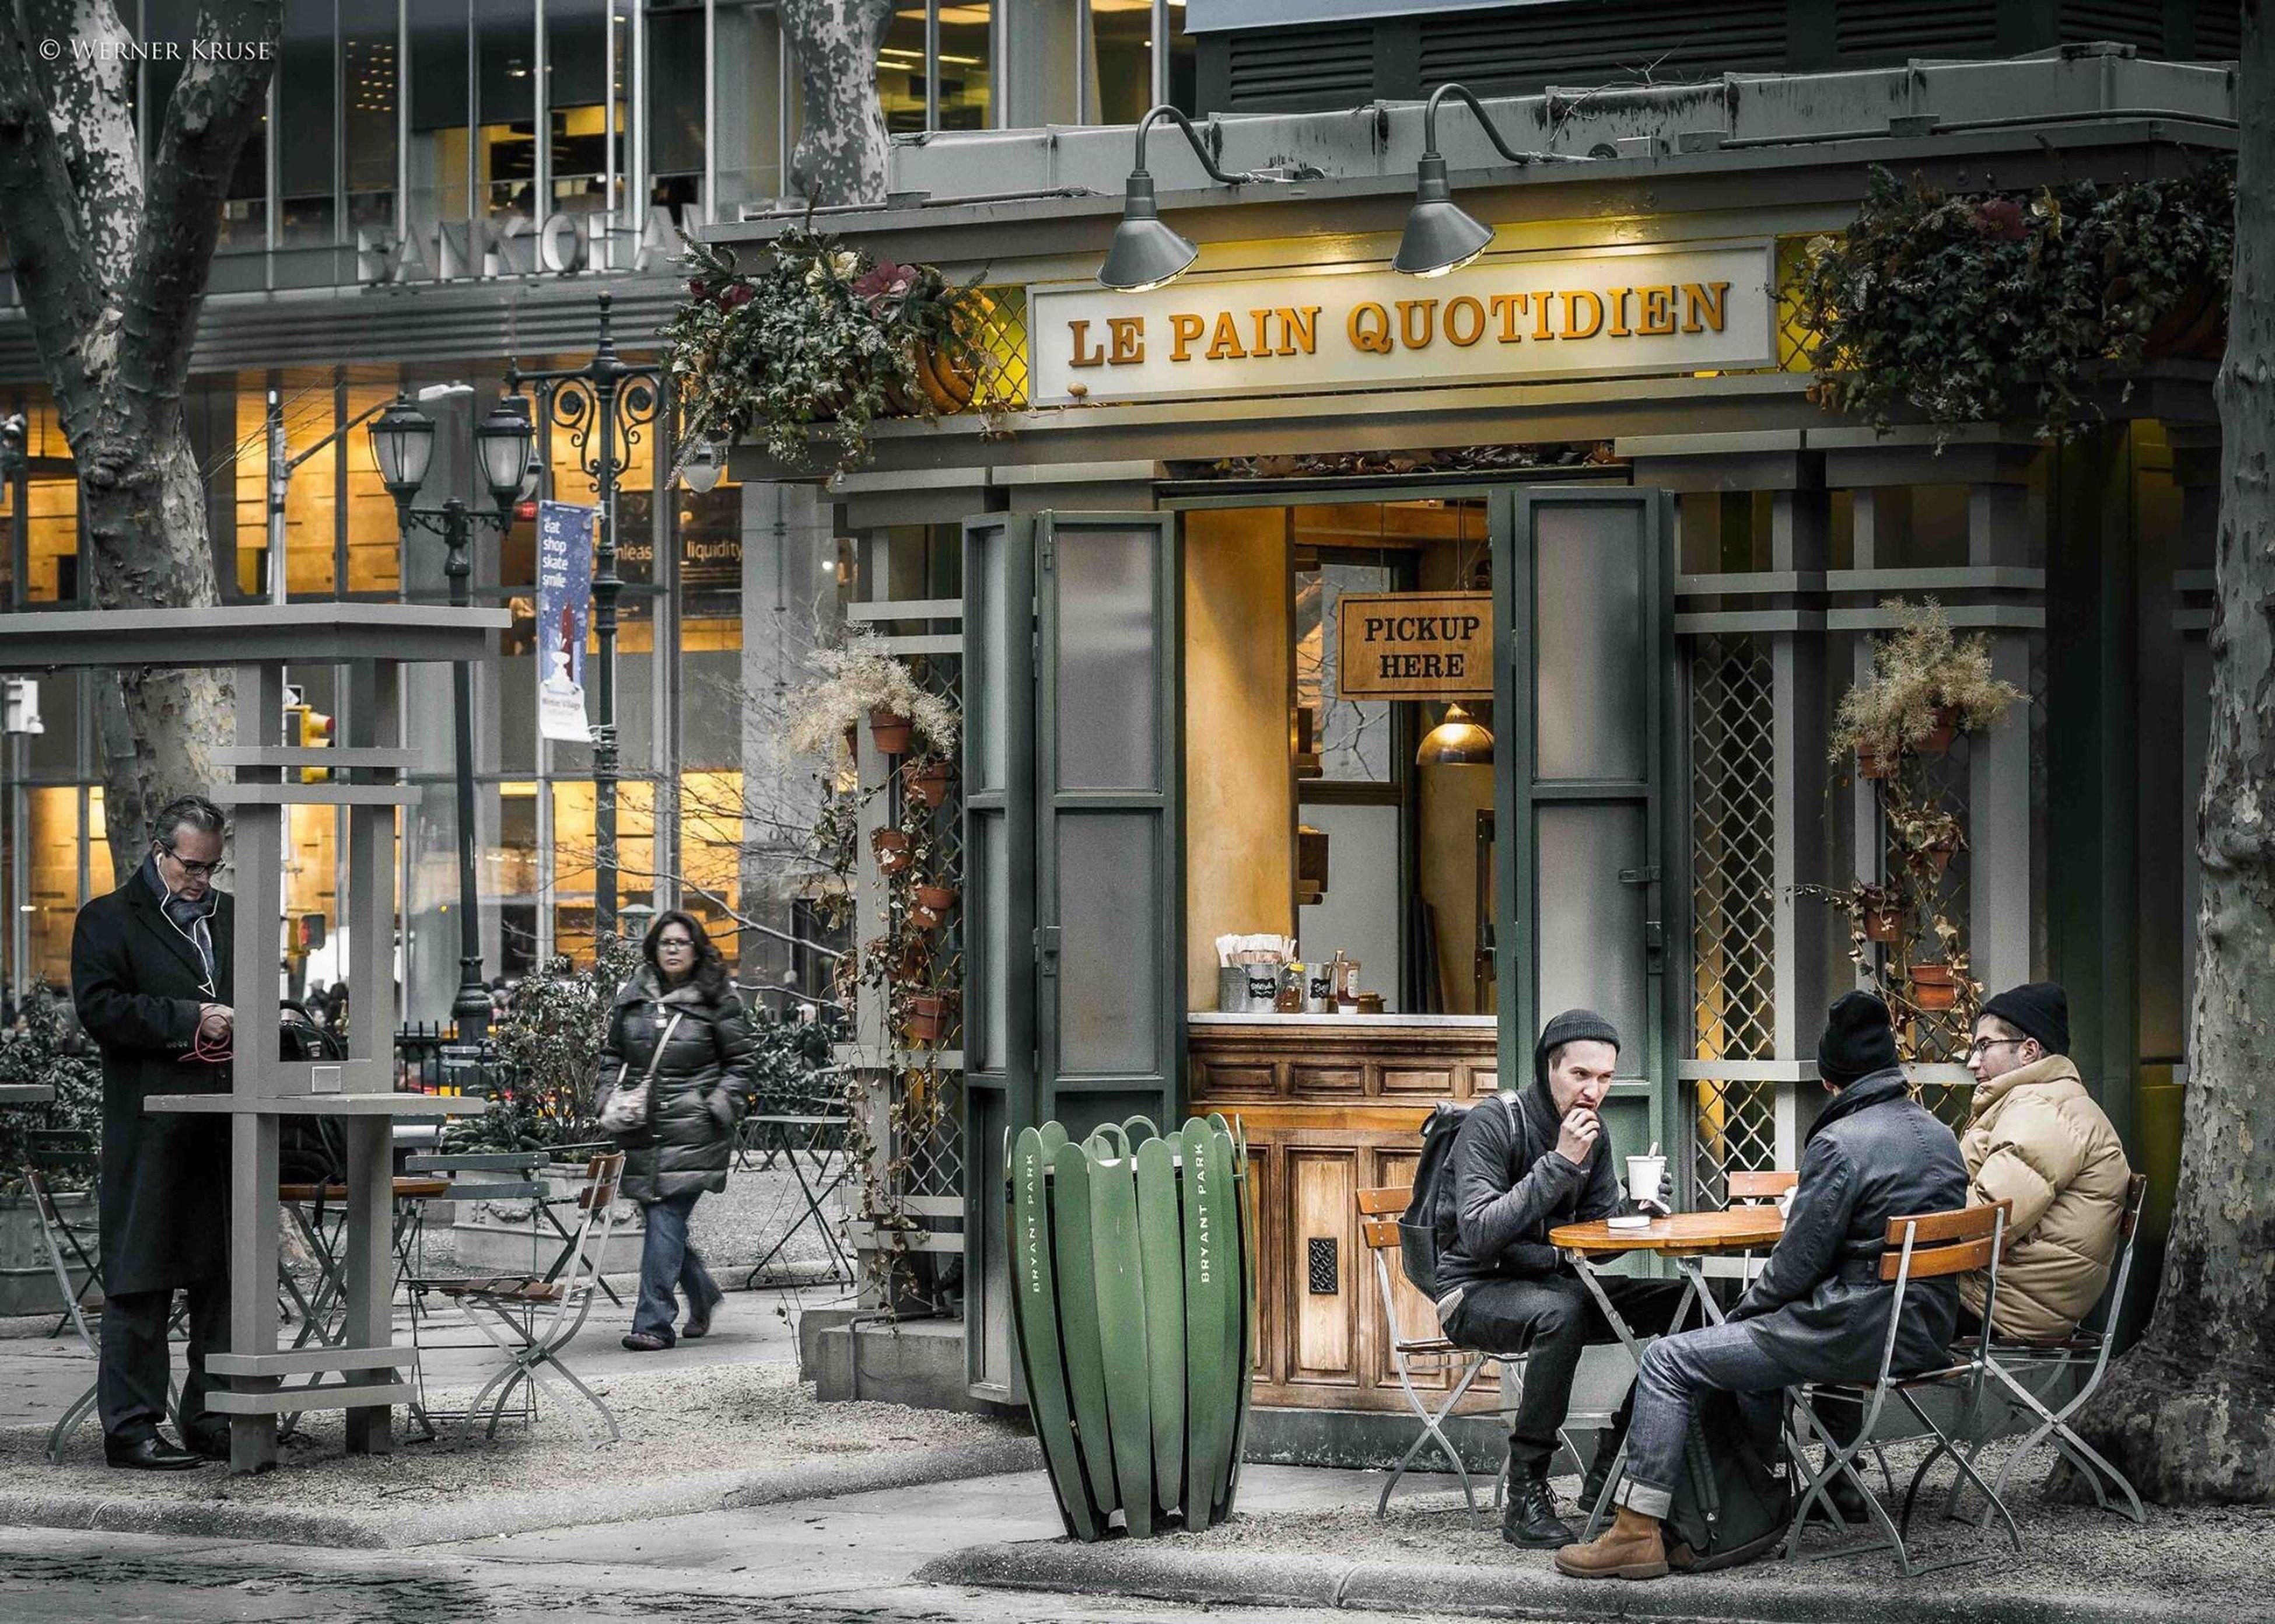 Le Pain QuotidienStreetDo[a:The Street Photographer - 2016 EyeEm AwardsnNYCgNew YorkhCityscapes]Streetphotography]New York City]CafeSBryantpark